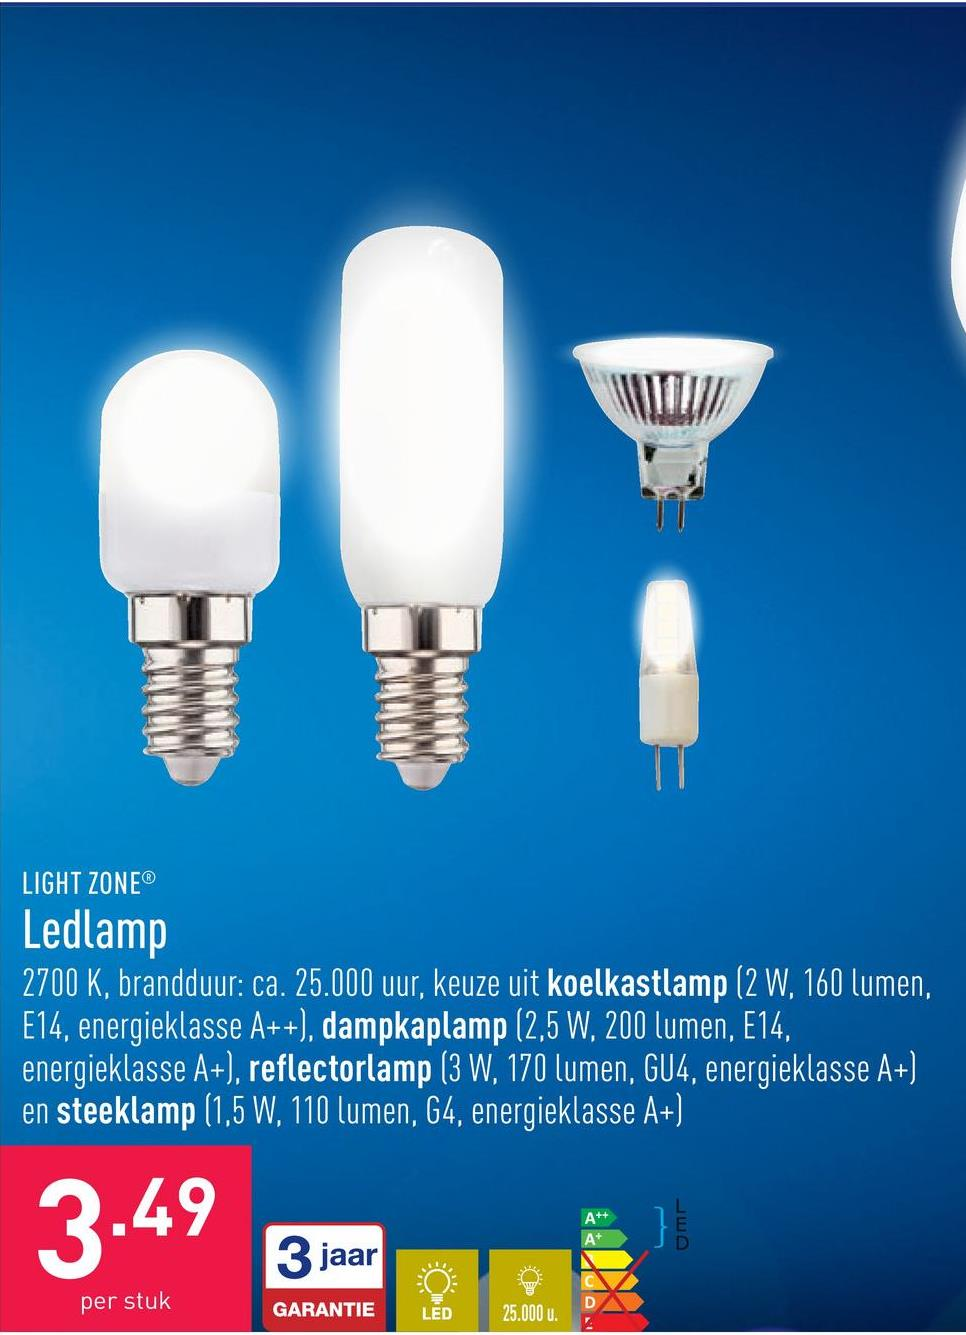 Ledlamp 2700 K, brandduur: ca. 25.000 uur, keuze uit koelkastlamp (2 W, 160 lumen, E14, energieklasse A++), dampkaplamp (2,5 W, 200 lumen, E14, energieklasse A+), reflectorlamp (3 W, 170 lumen, GU4, energieklasse A+) en steeklamp (1,5 W, 110 lumen, G4, energieklasse A+)